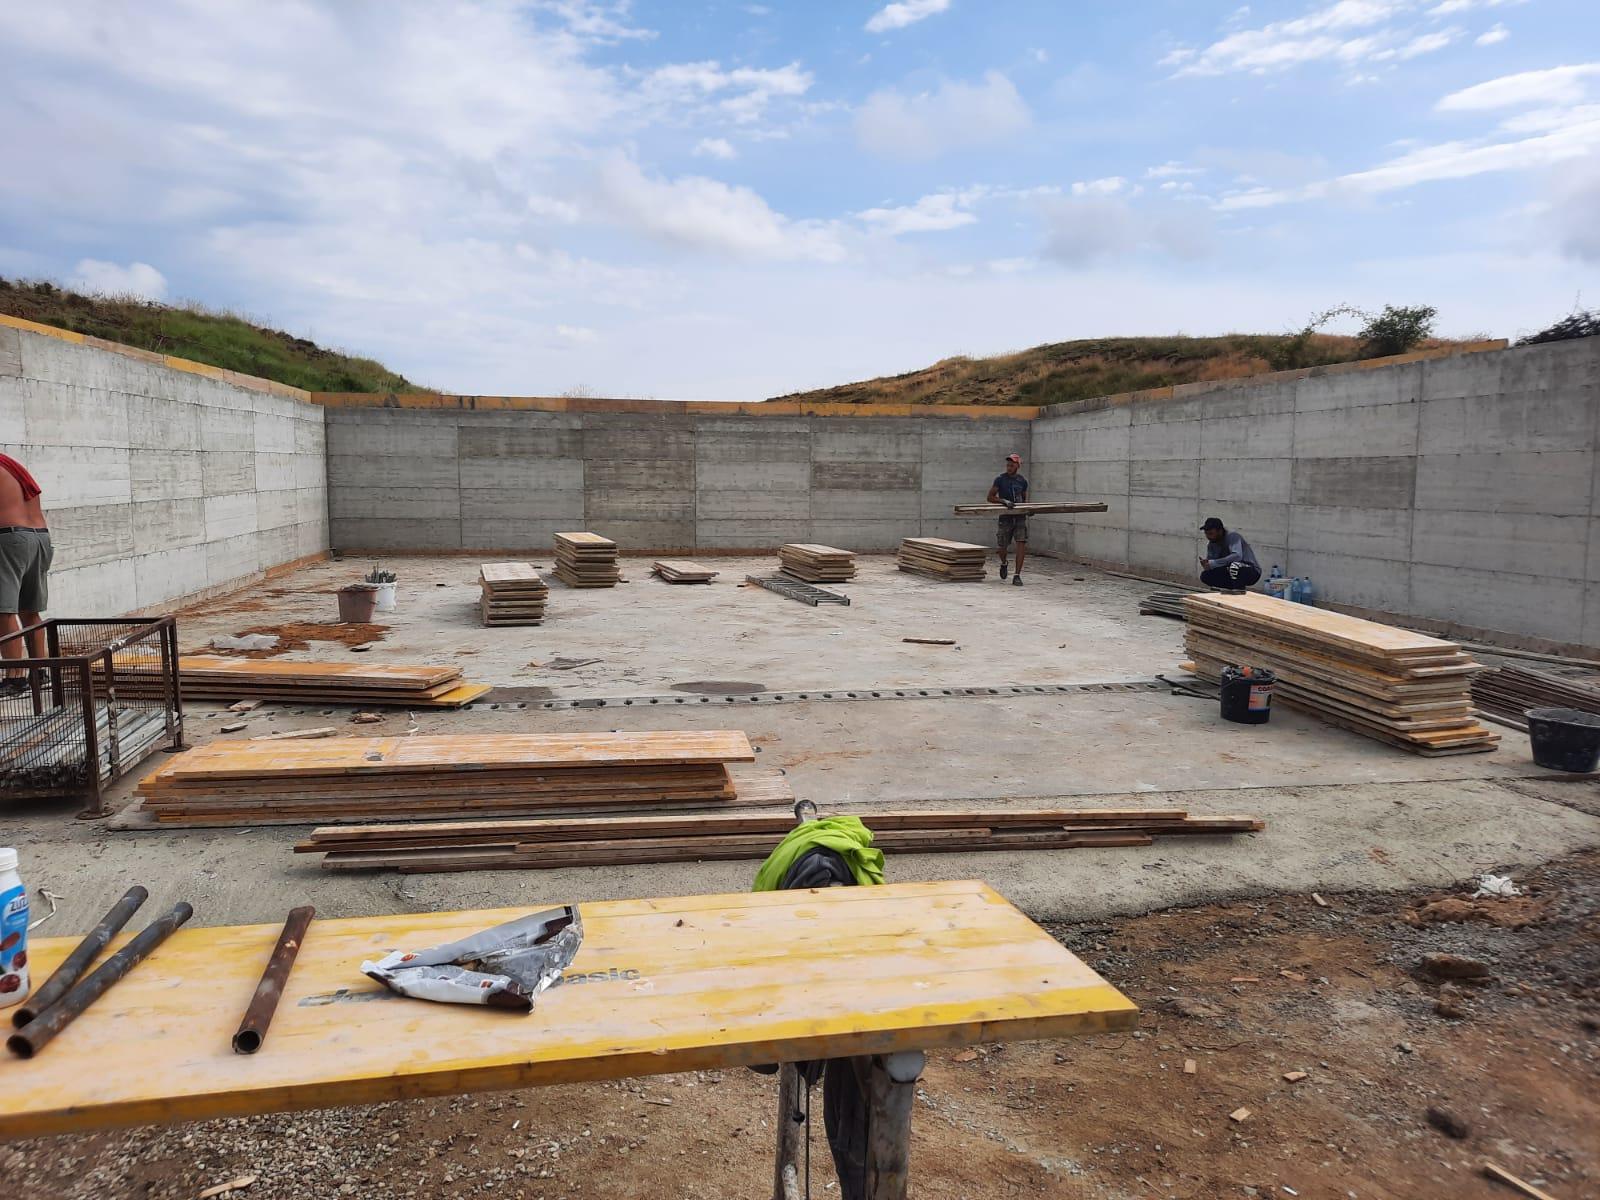 Construire platforma depozitare gunoi de grajd-proiect 61/2020 Dumbrava